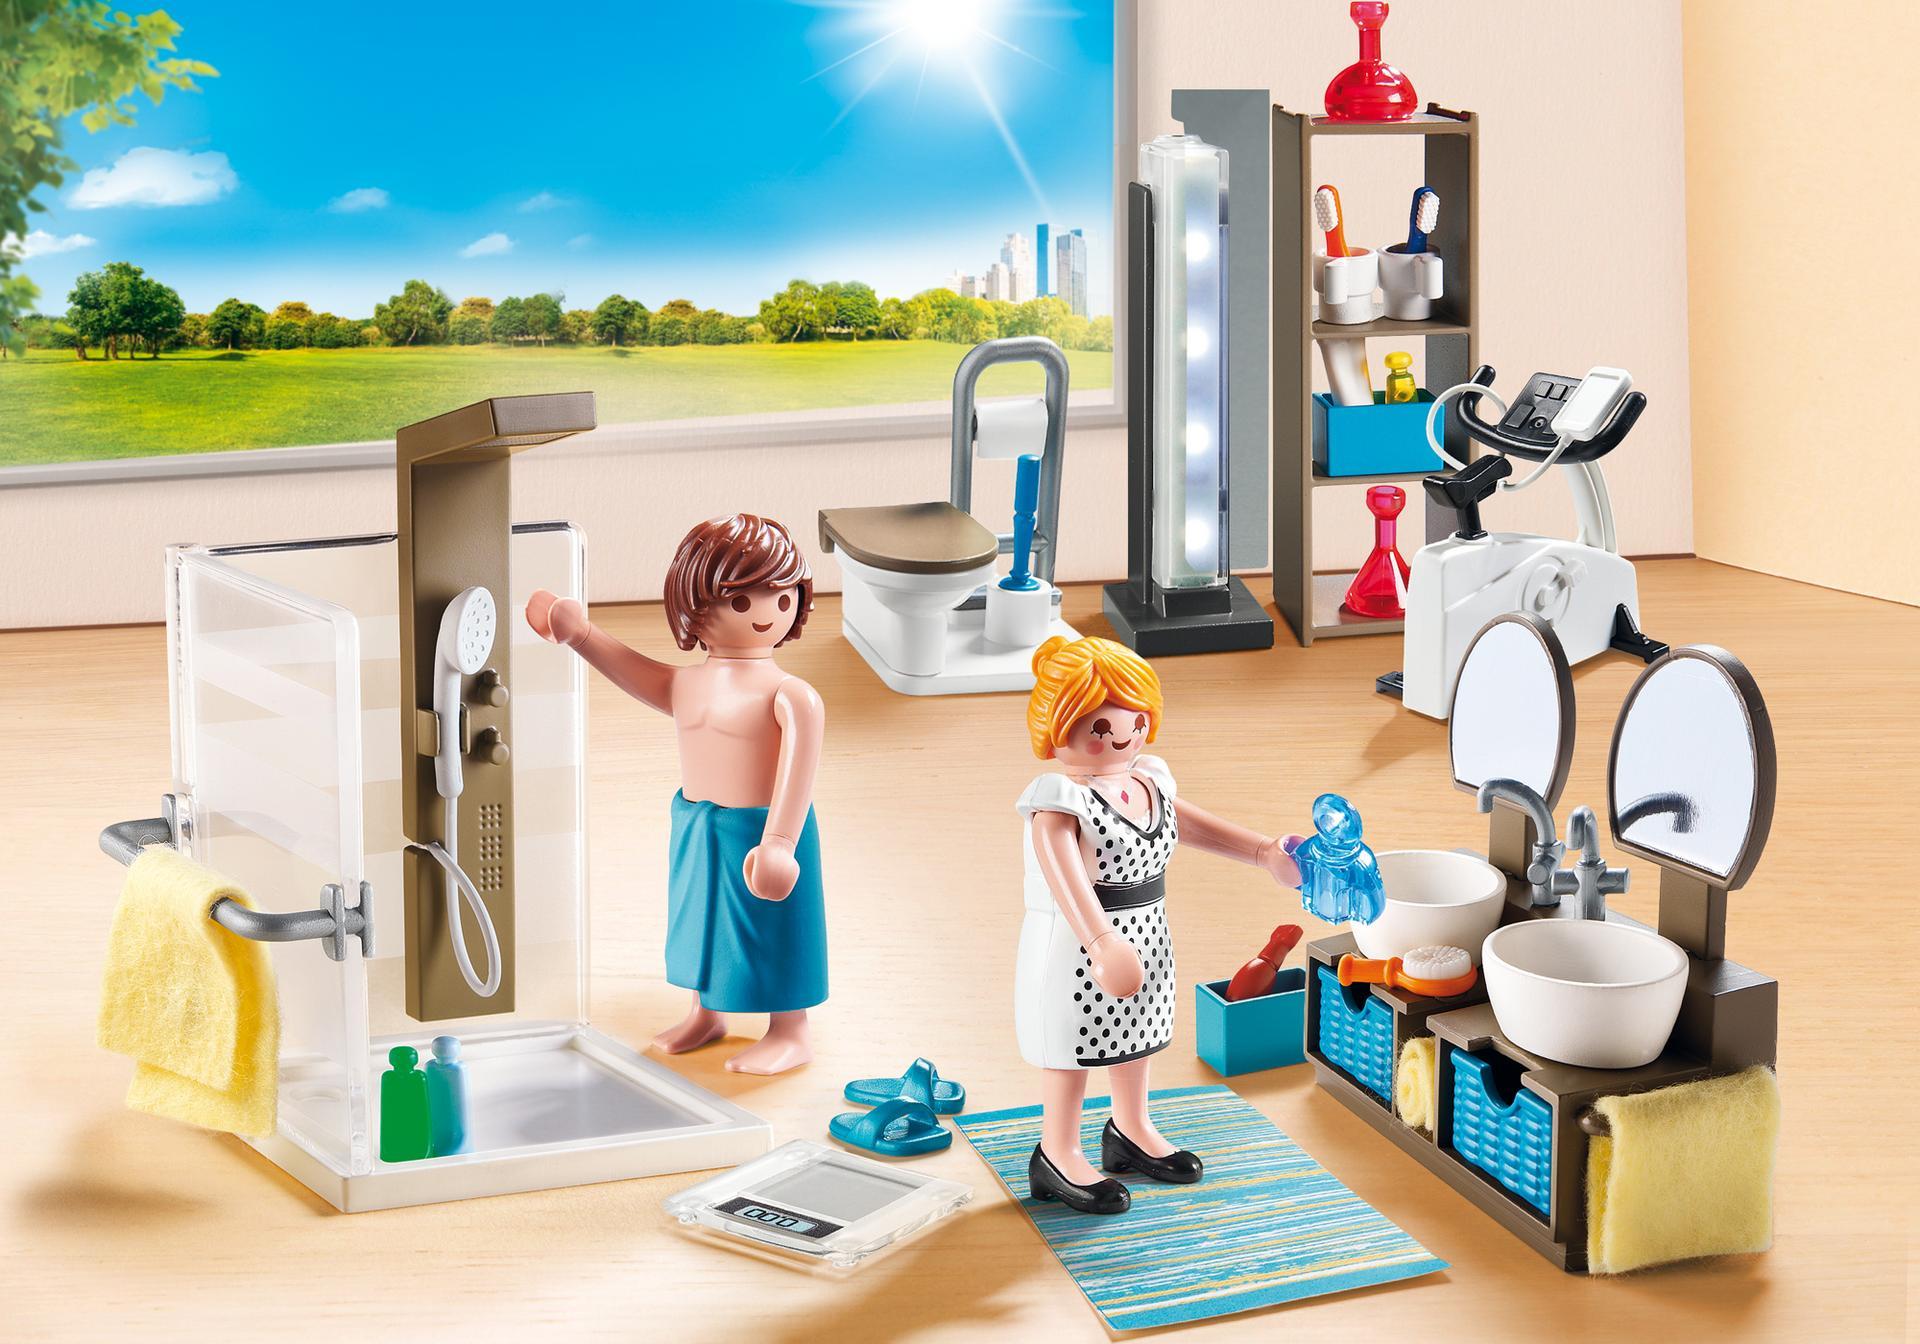 badezimmer 9268 playmobil deutschland. Black Bedroom Furniture Sets. Home Design Ideas